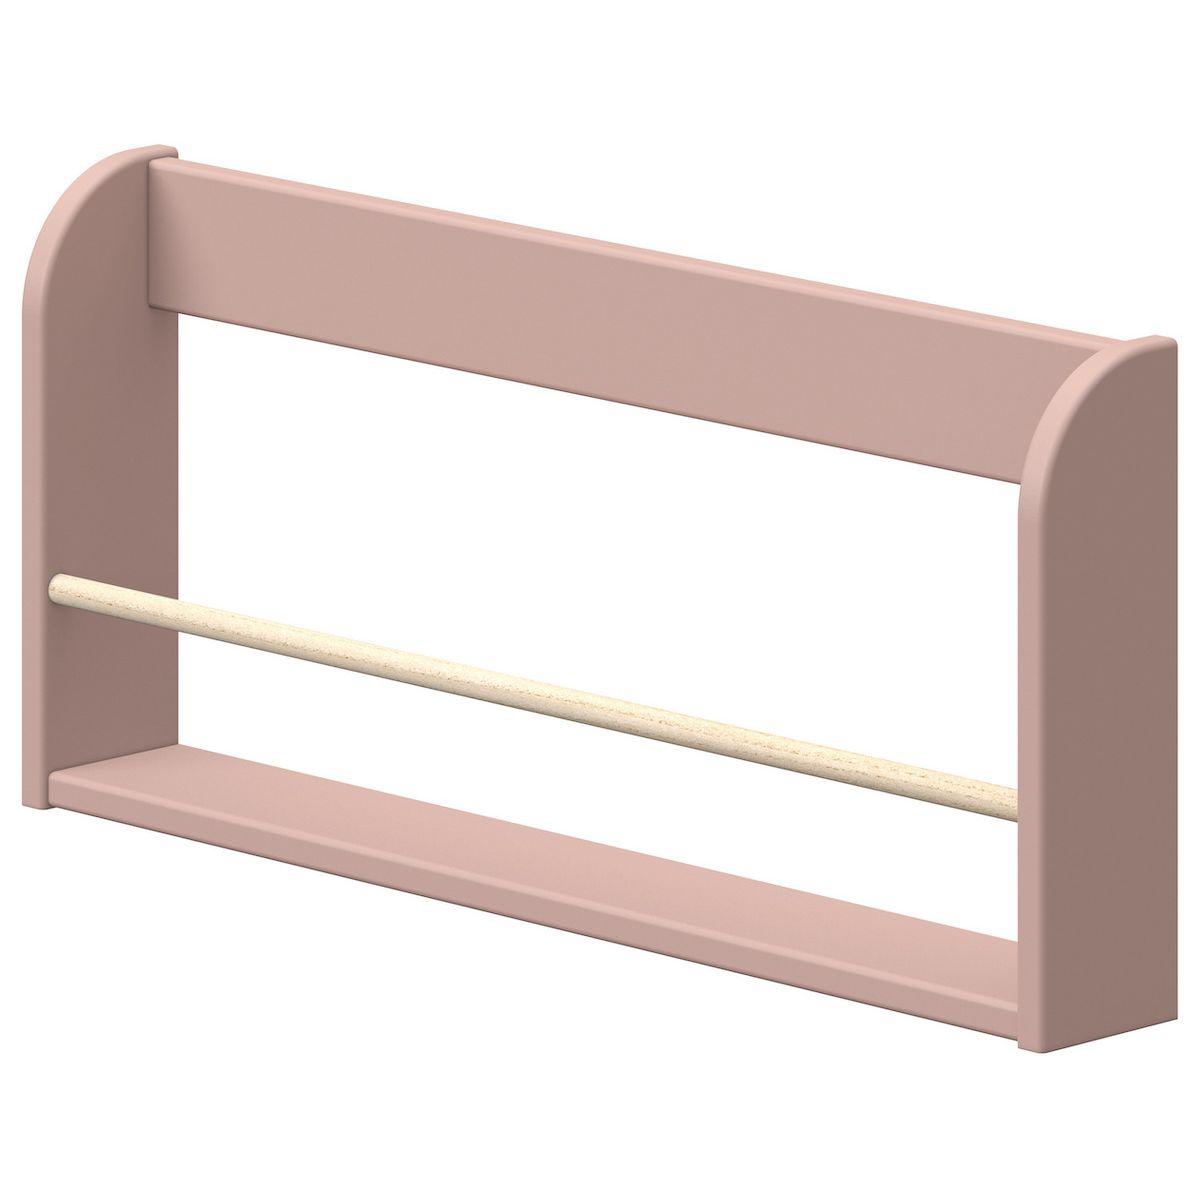 Estantería pared infantil DOTS Flexa rosa